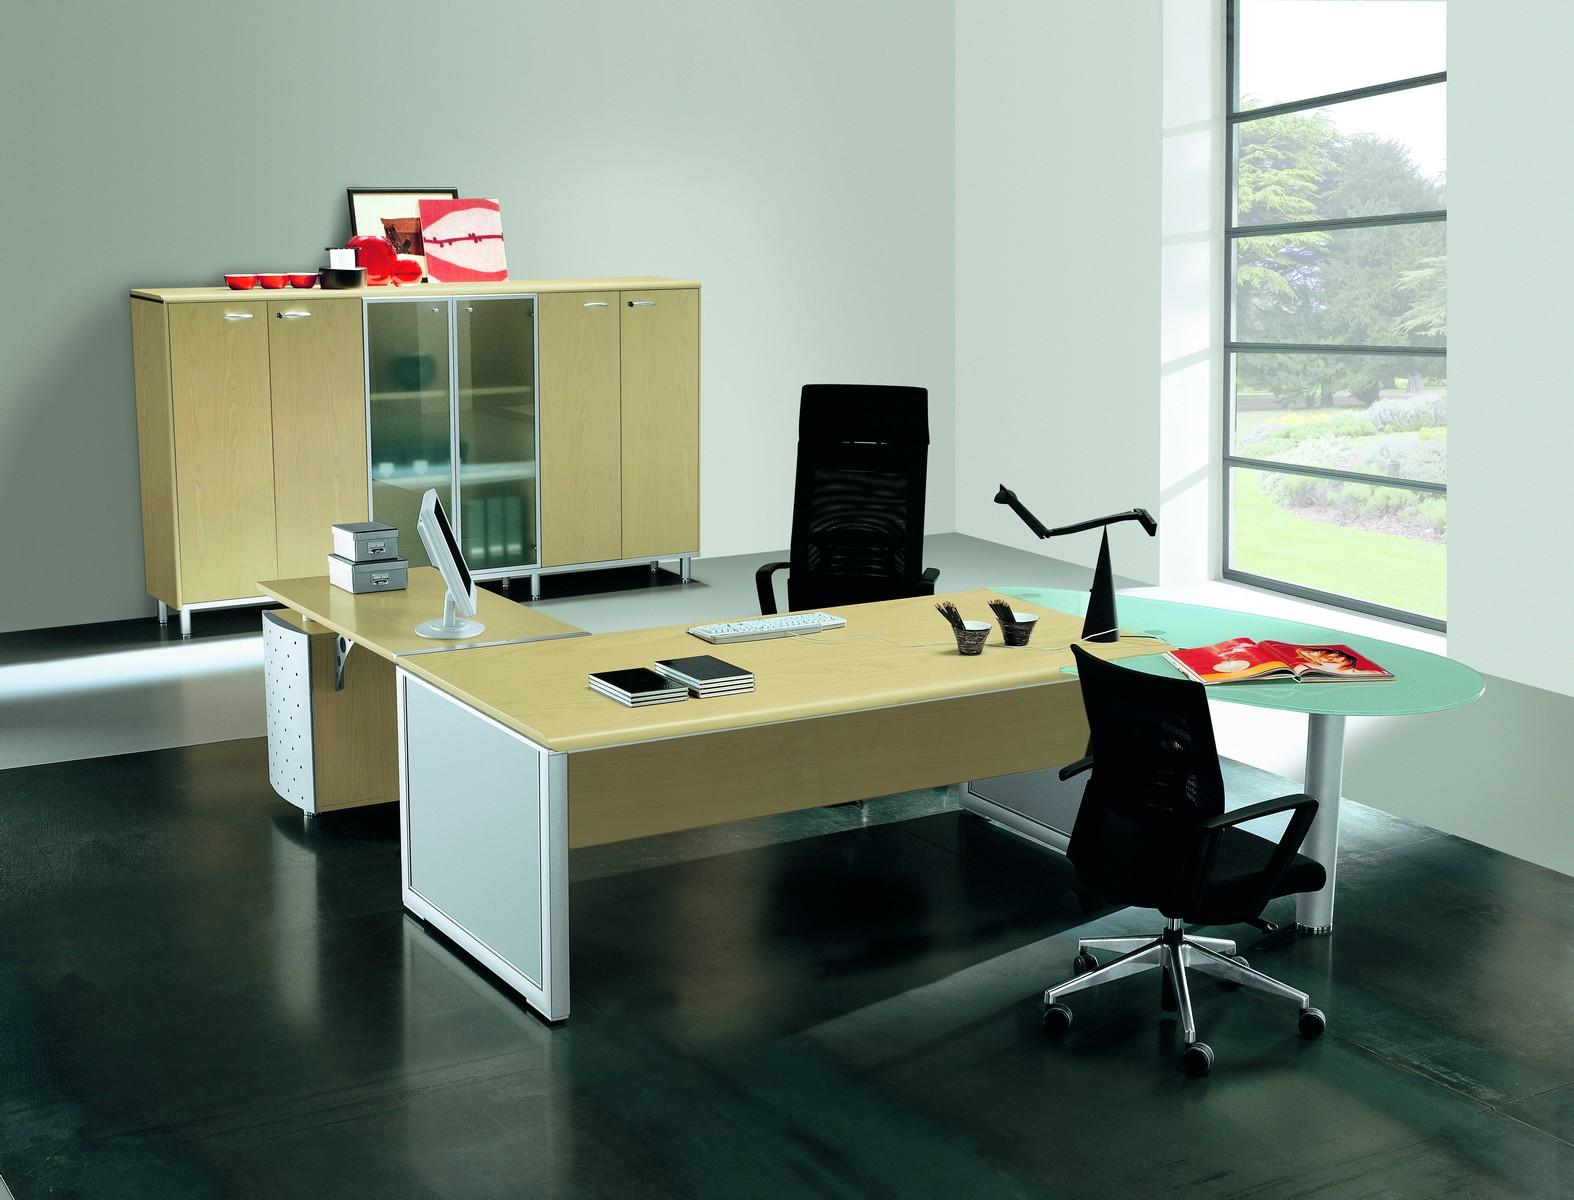 zeta desk chair antique wooden executive desking richardsons office furniture and